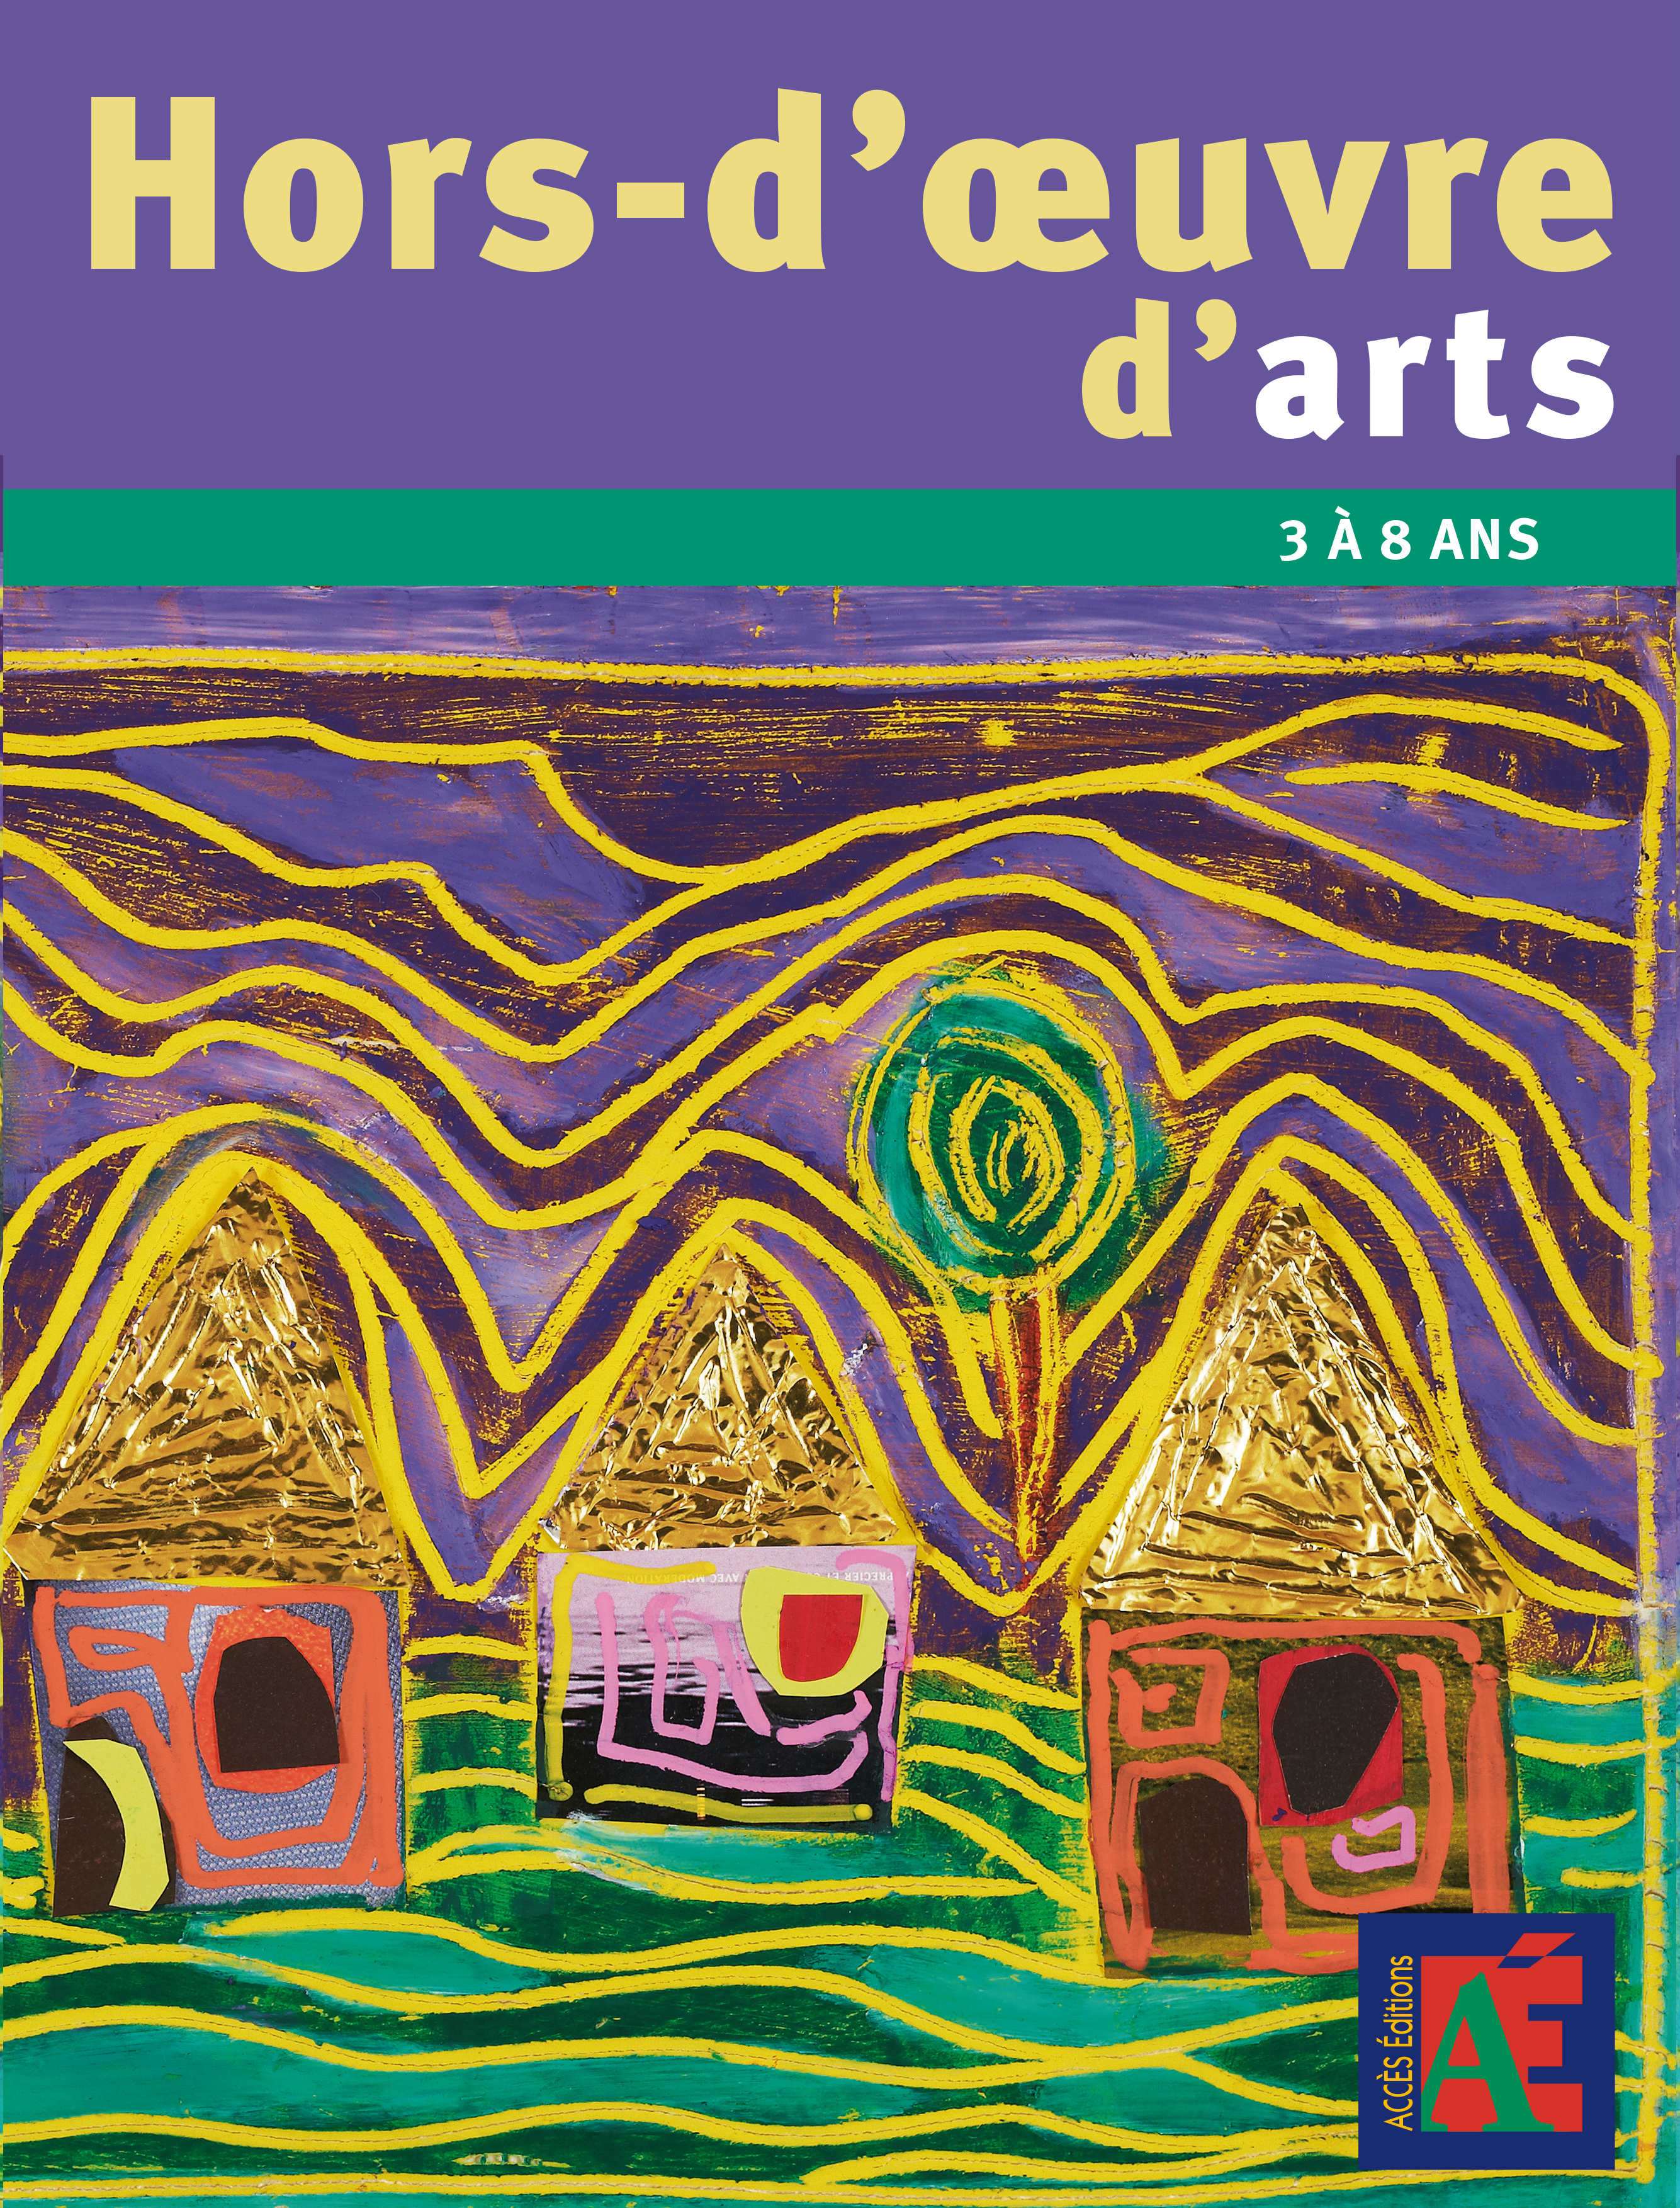 HORS-D'OEUVRE D'ARTS 3 A 8 ANS